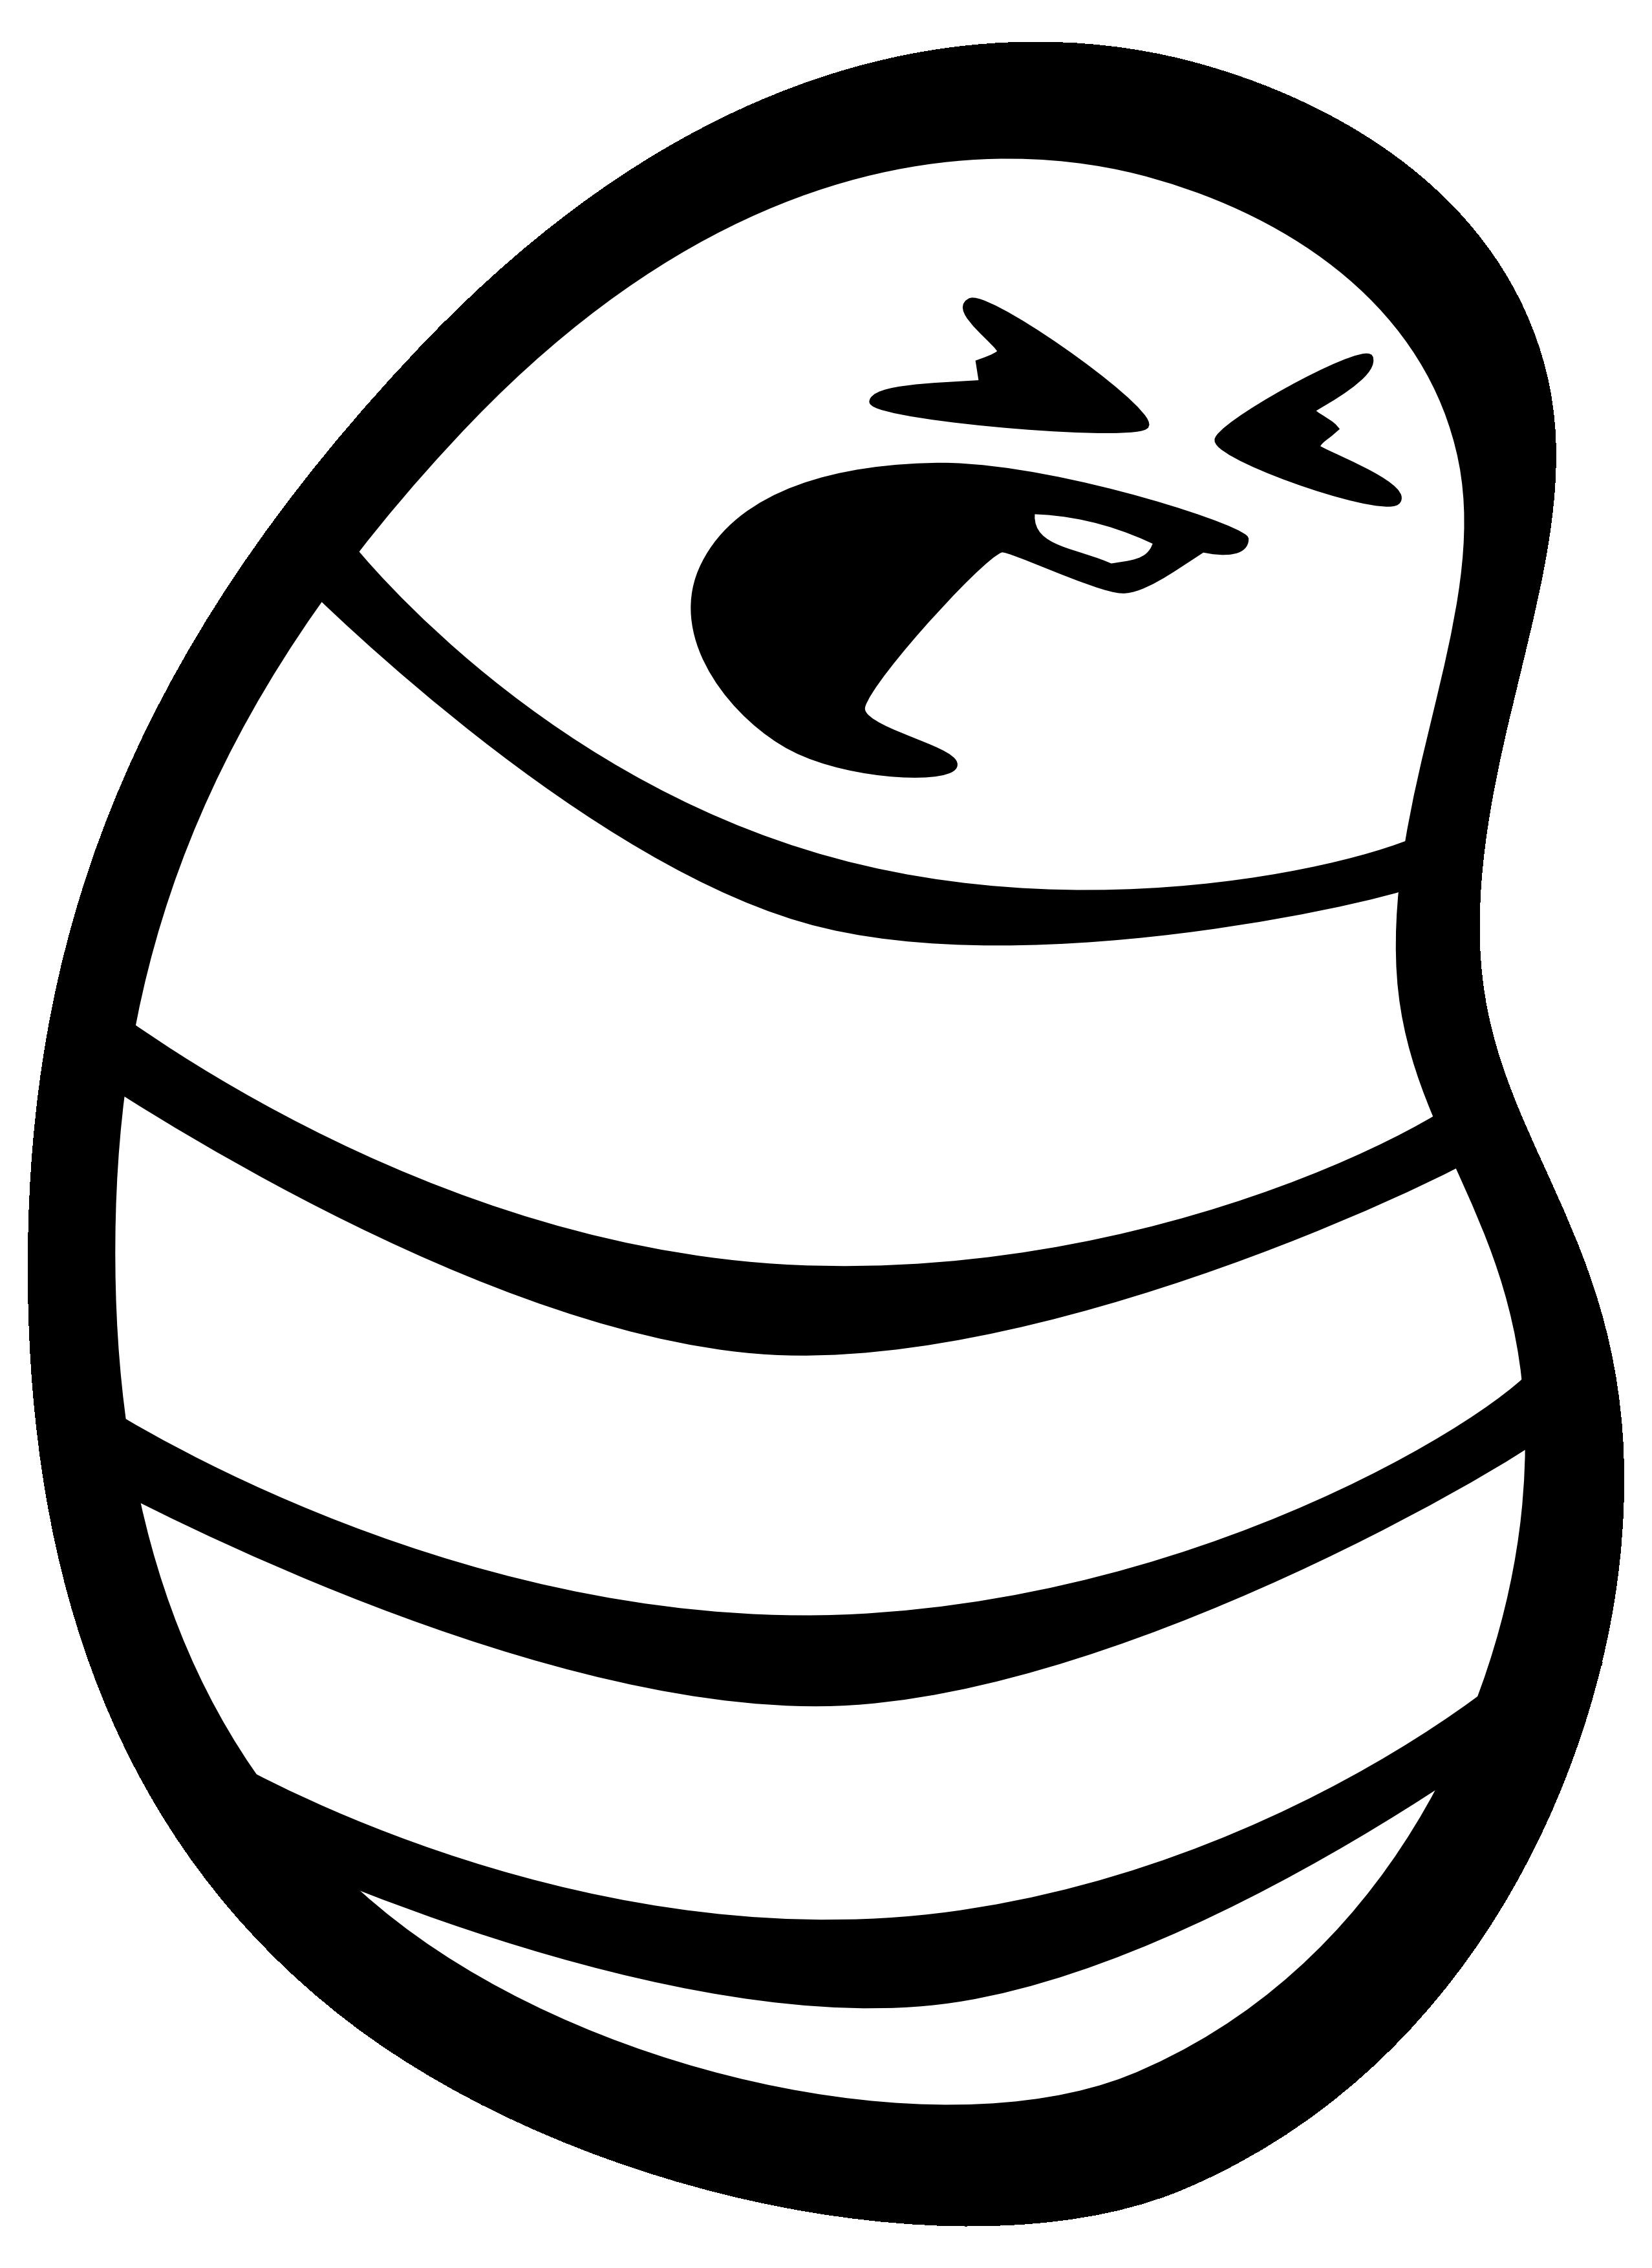 Worm clipart maggot. Panda free images maggotclipart